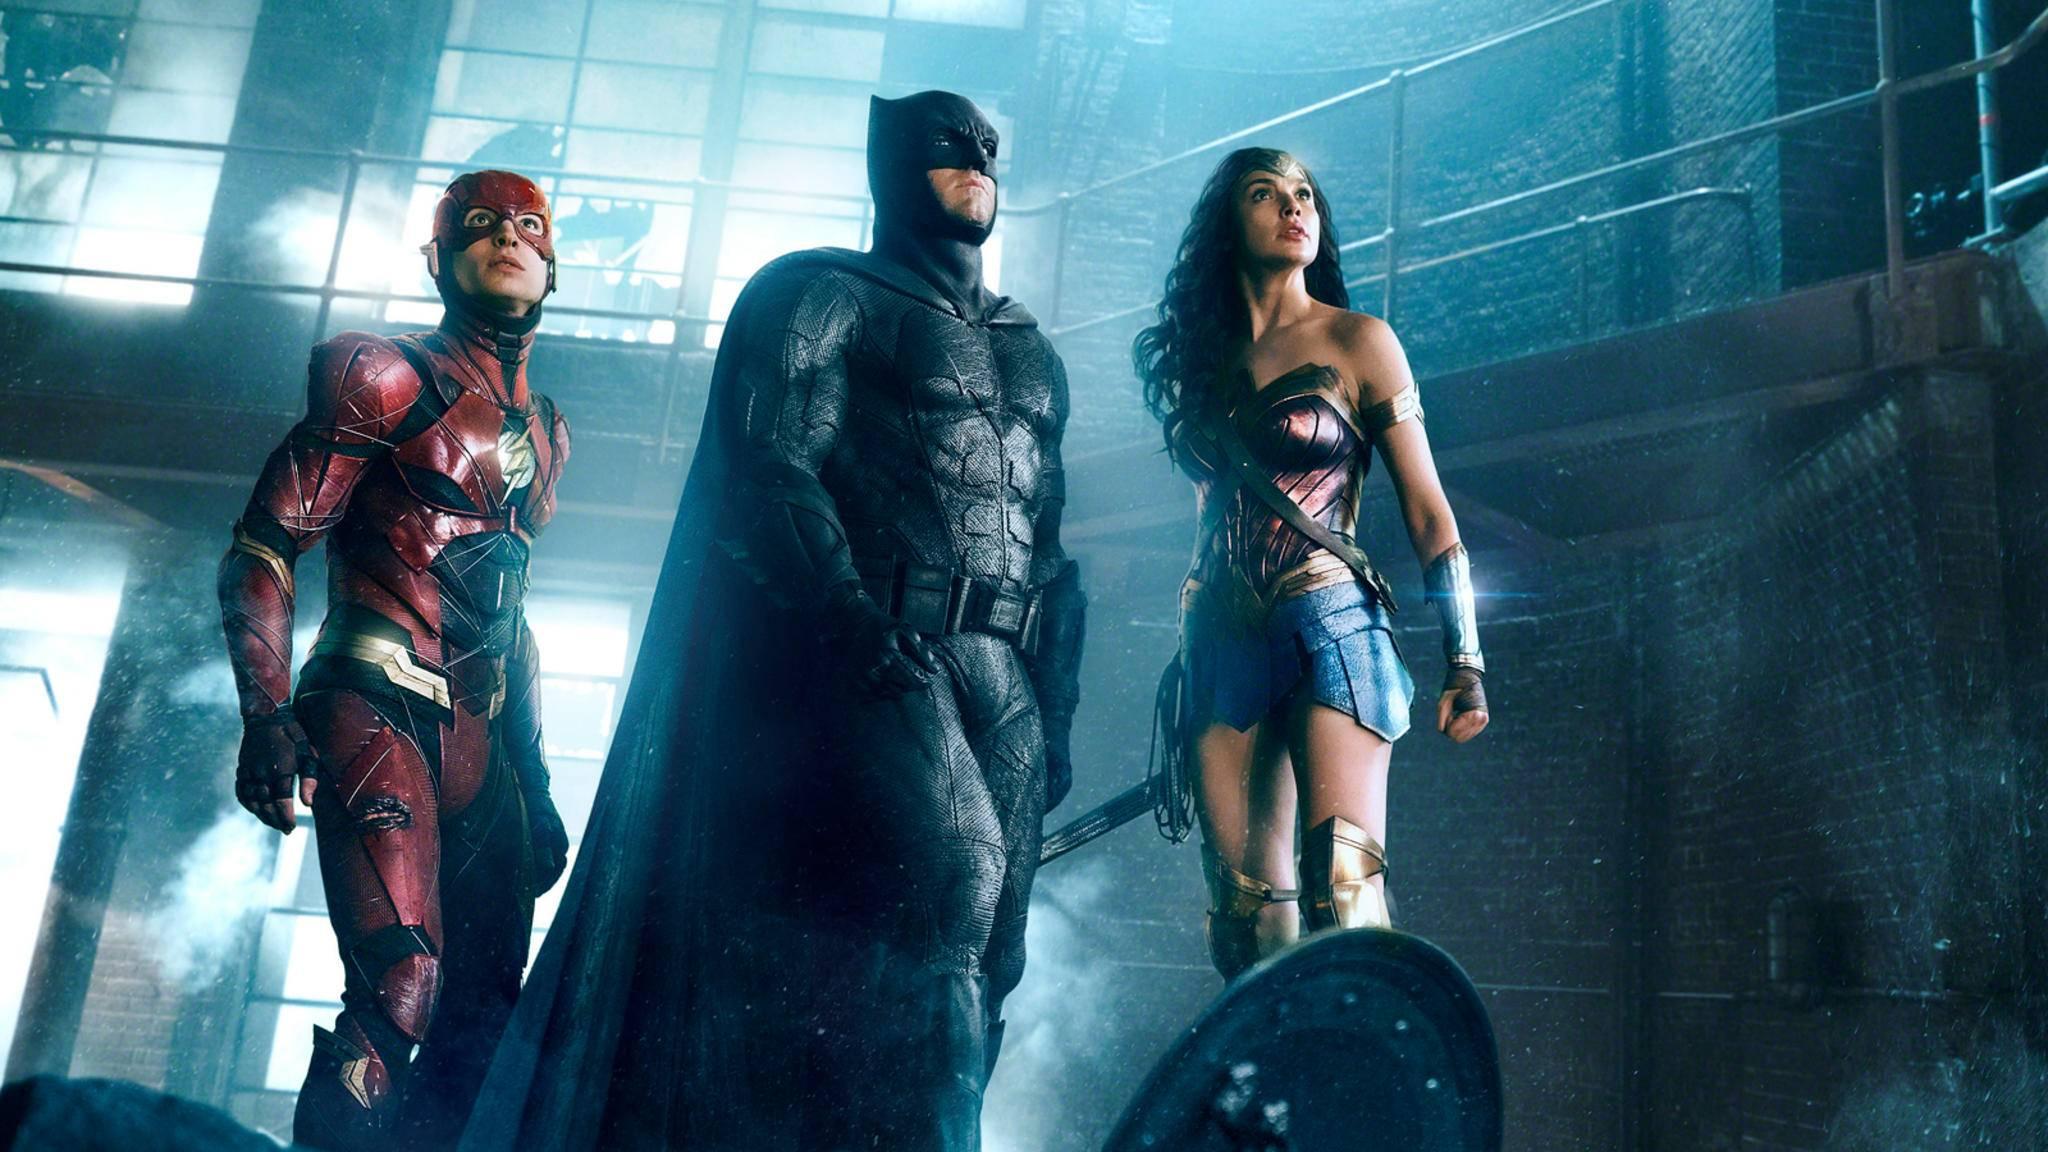 """Justice League"" soll weniger finster werden."